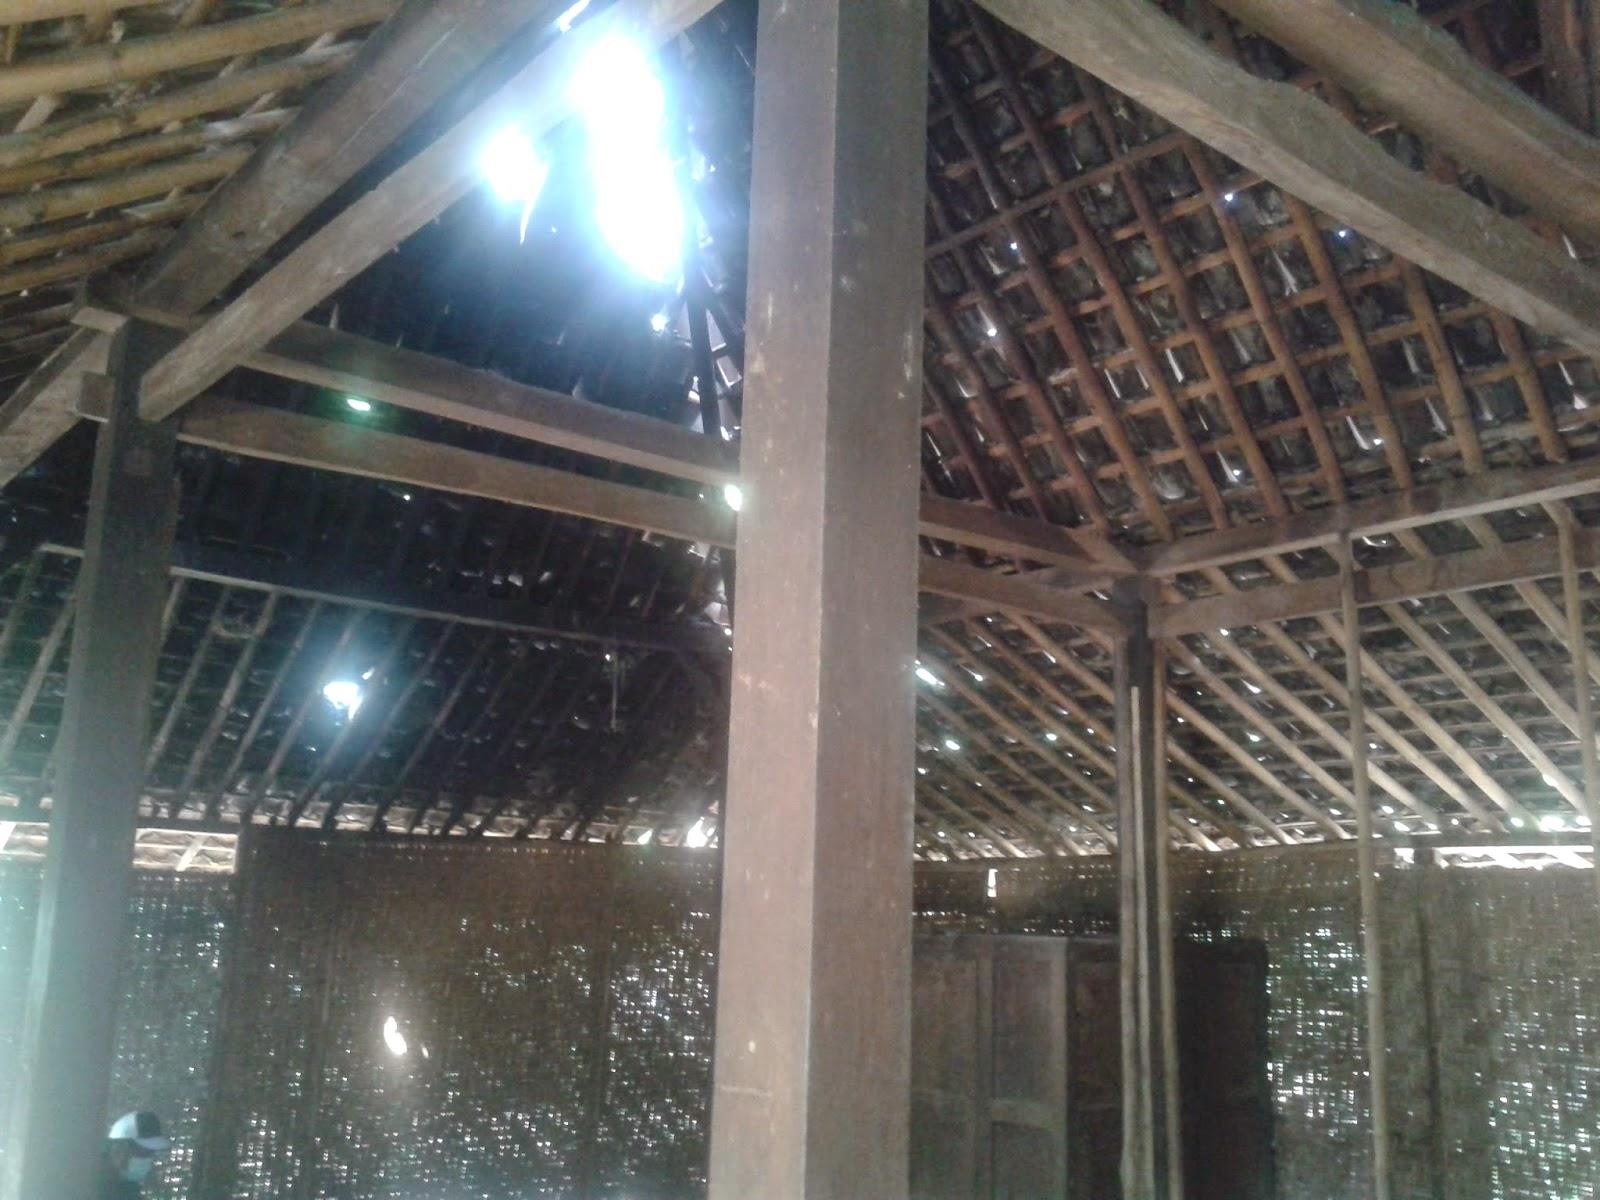 limasan%2B(4) & Rumah Limasan Jawa Kuno Kayu Jati | Rumah Kayu Jati Joglo Dan ...